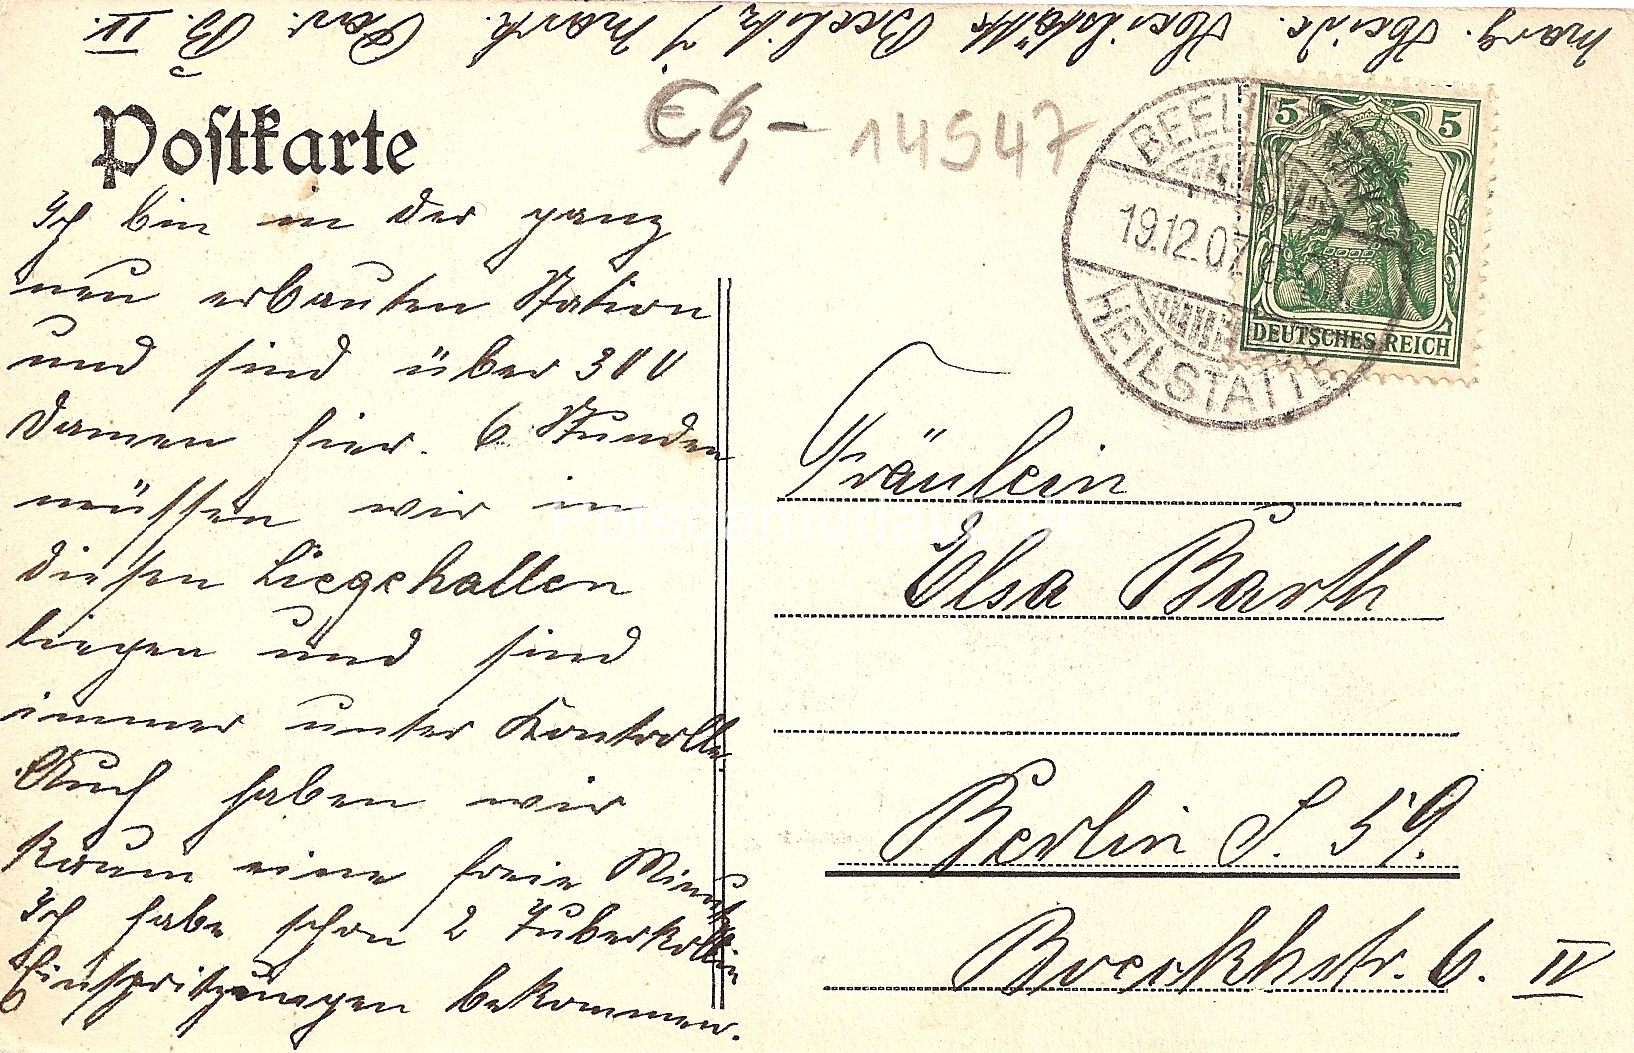 1907 12 19